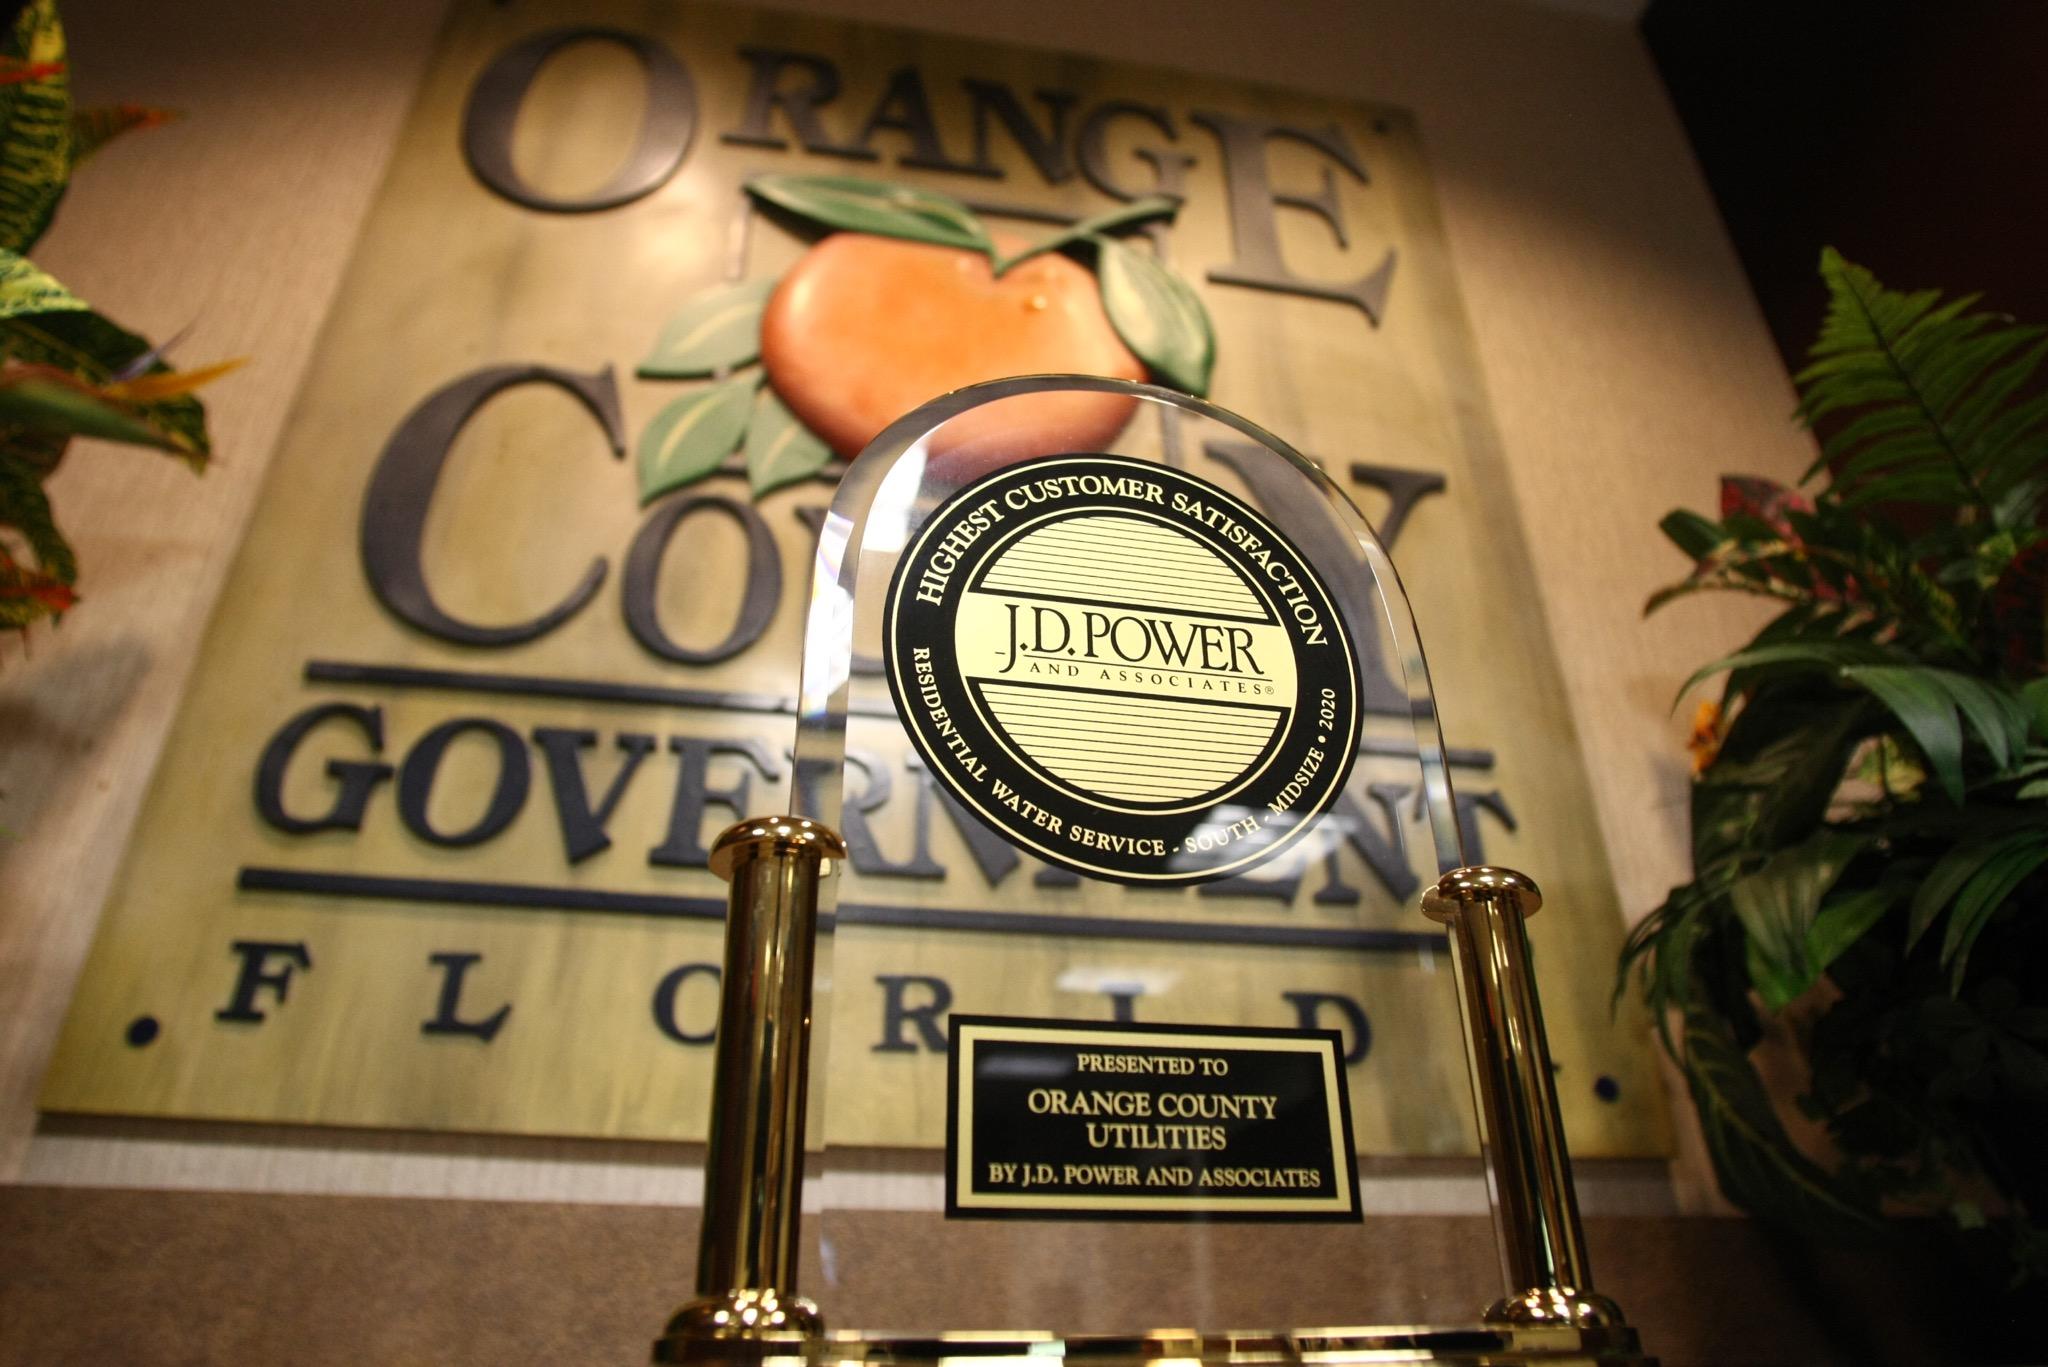 Photo of JD Power Award